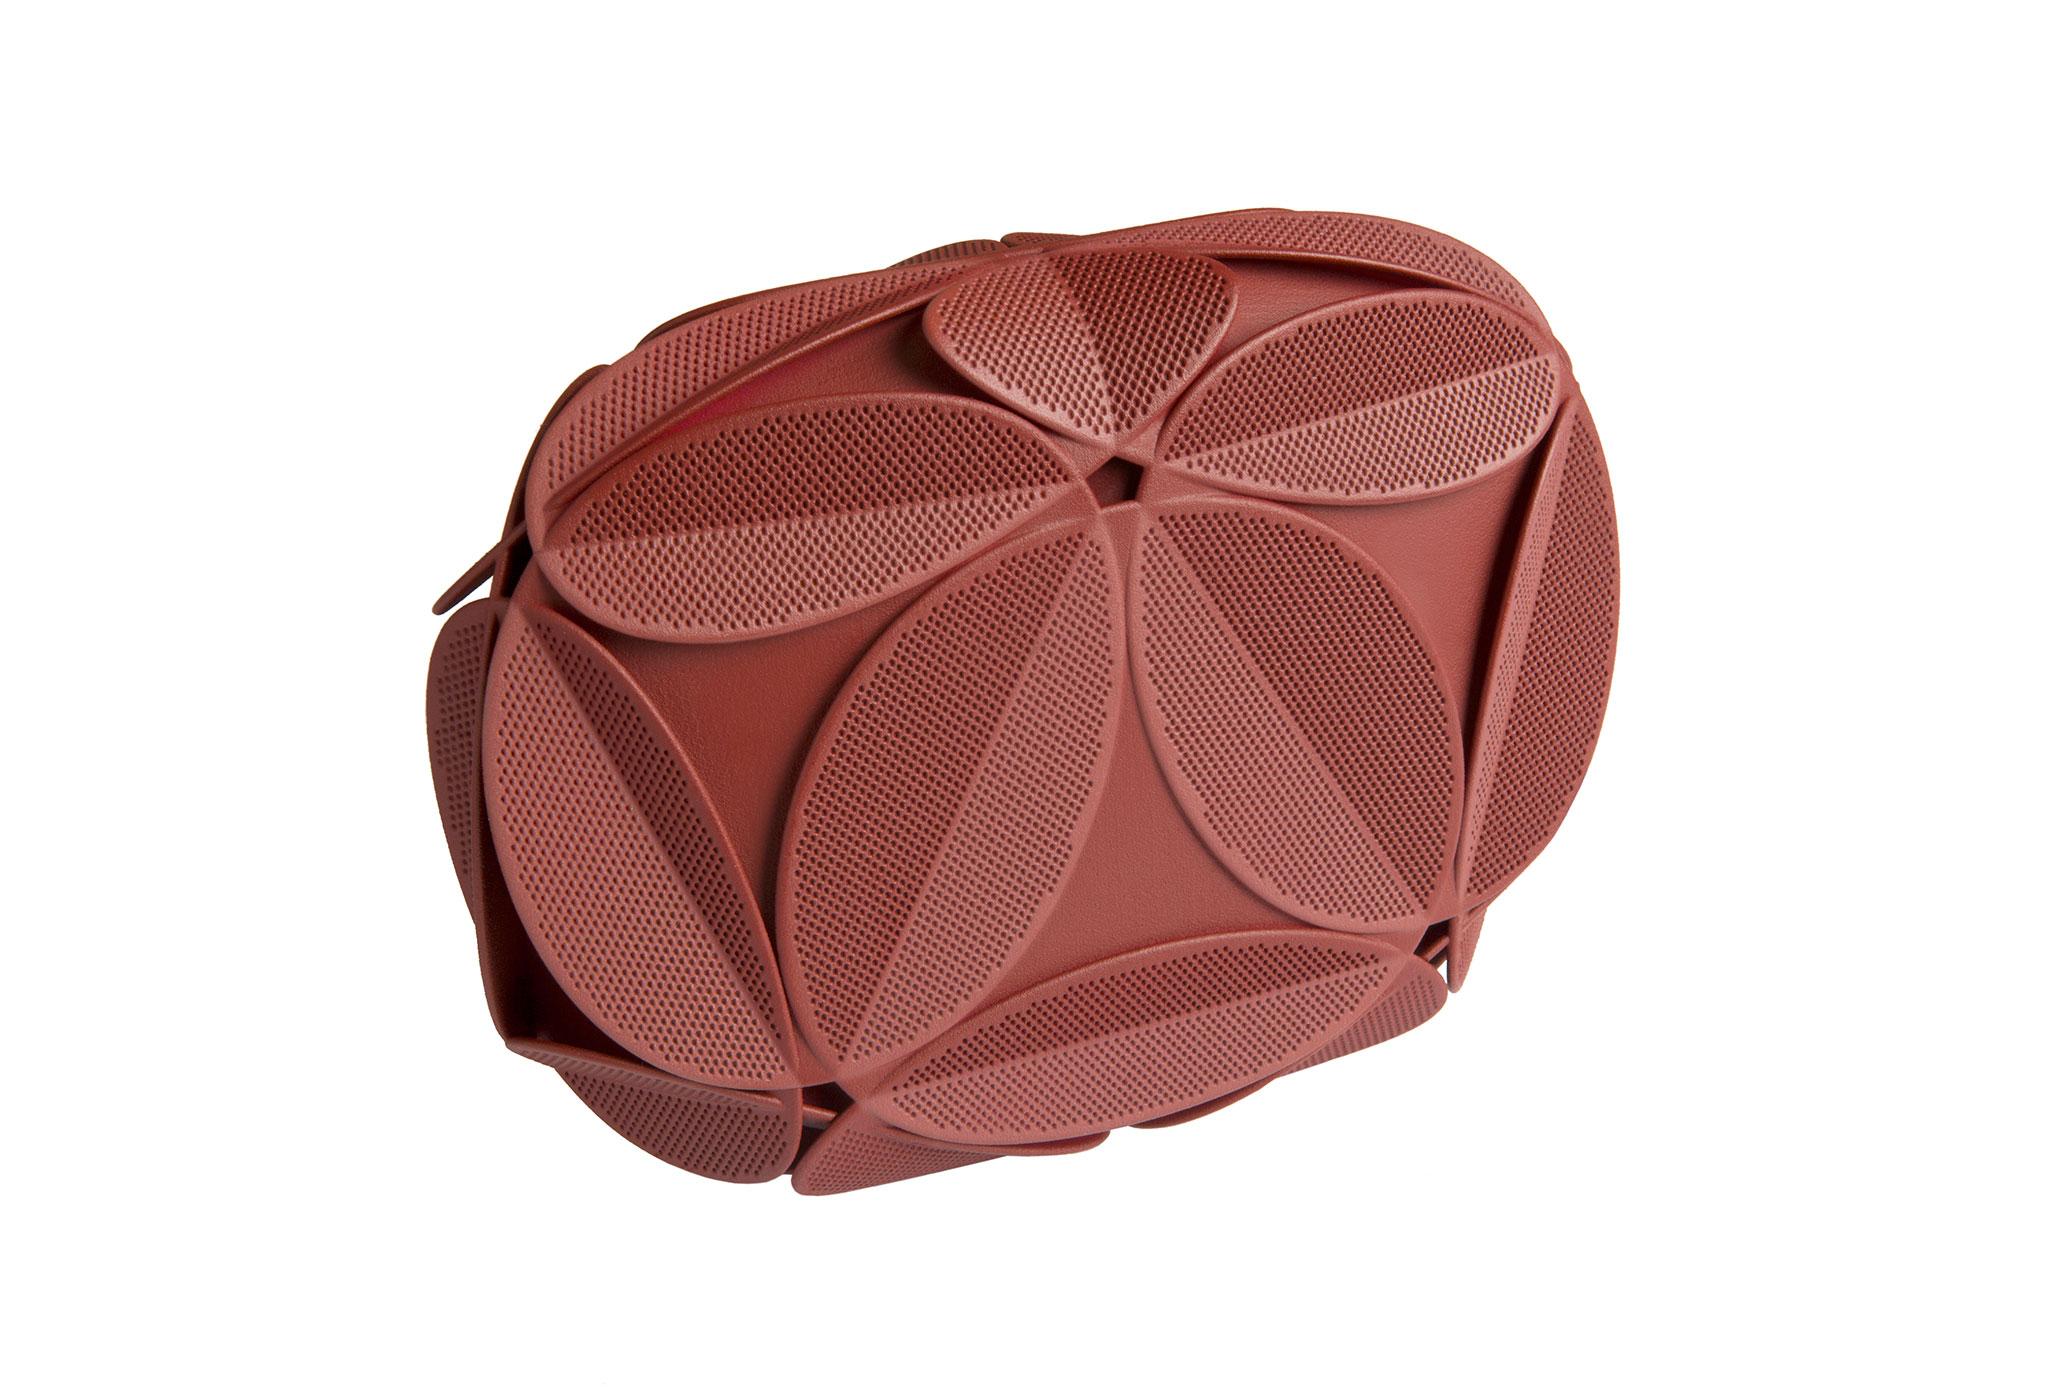 Ivy-3D-Printed-Clutch-Maison-203-10